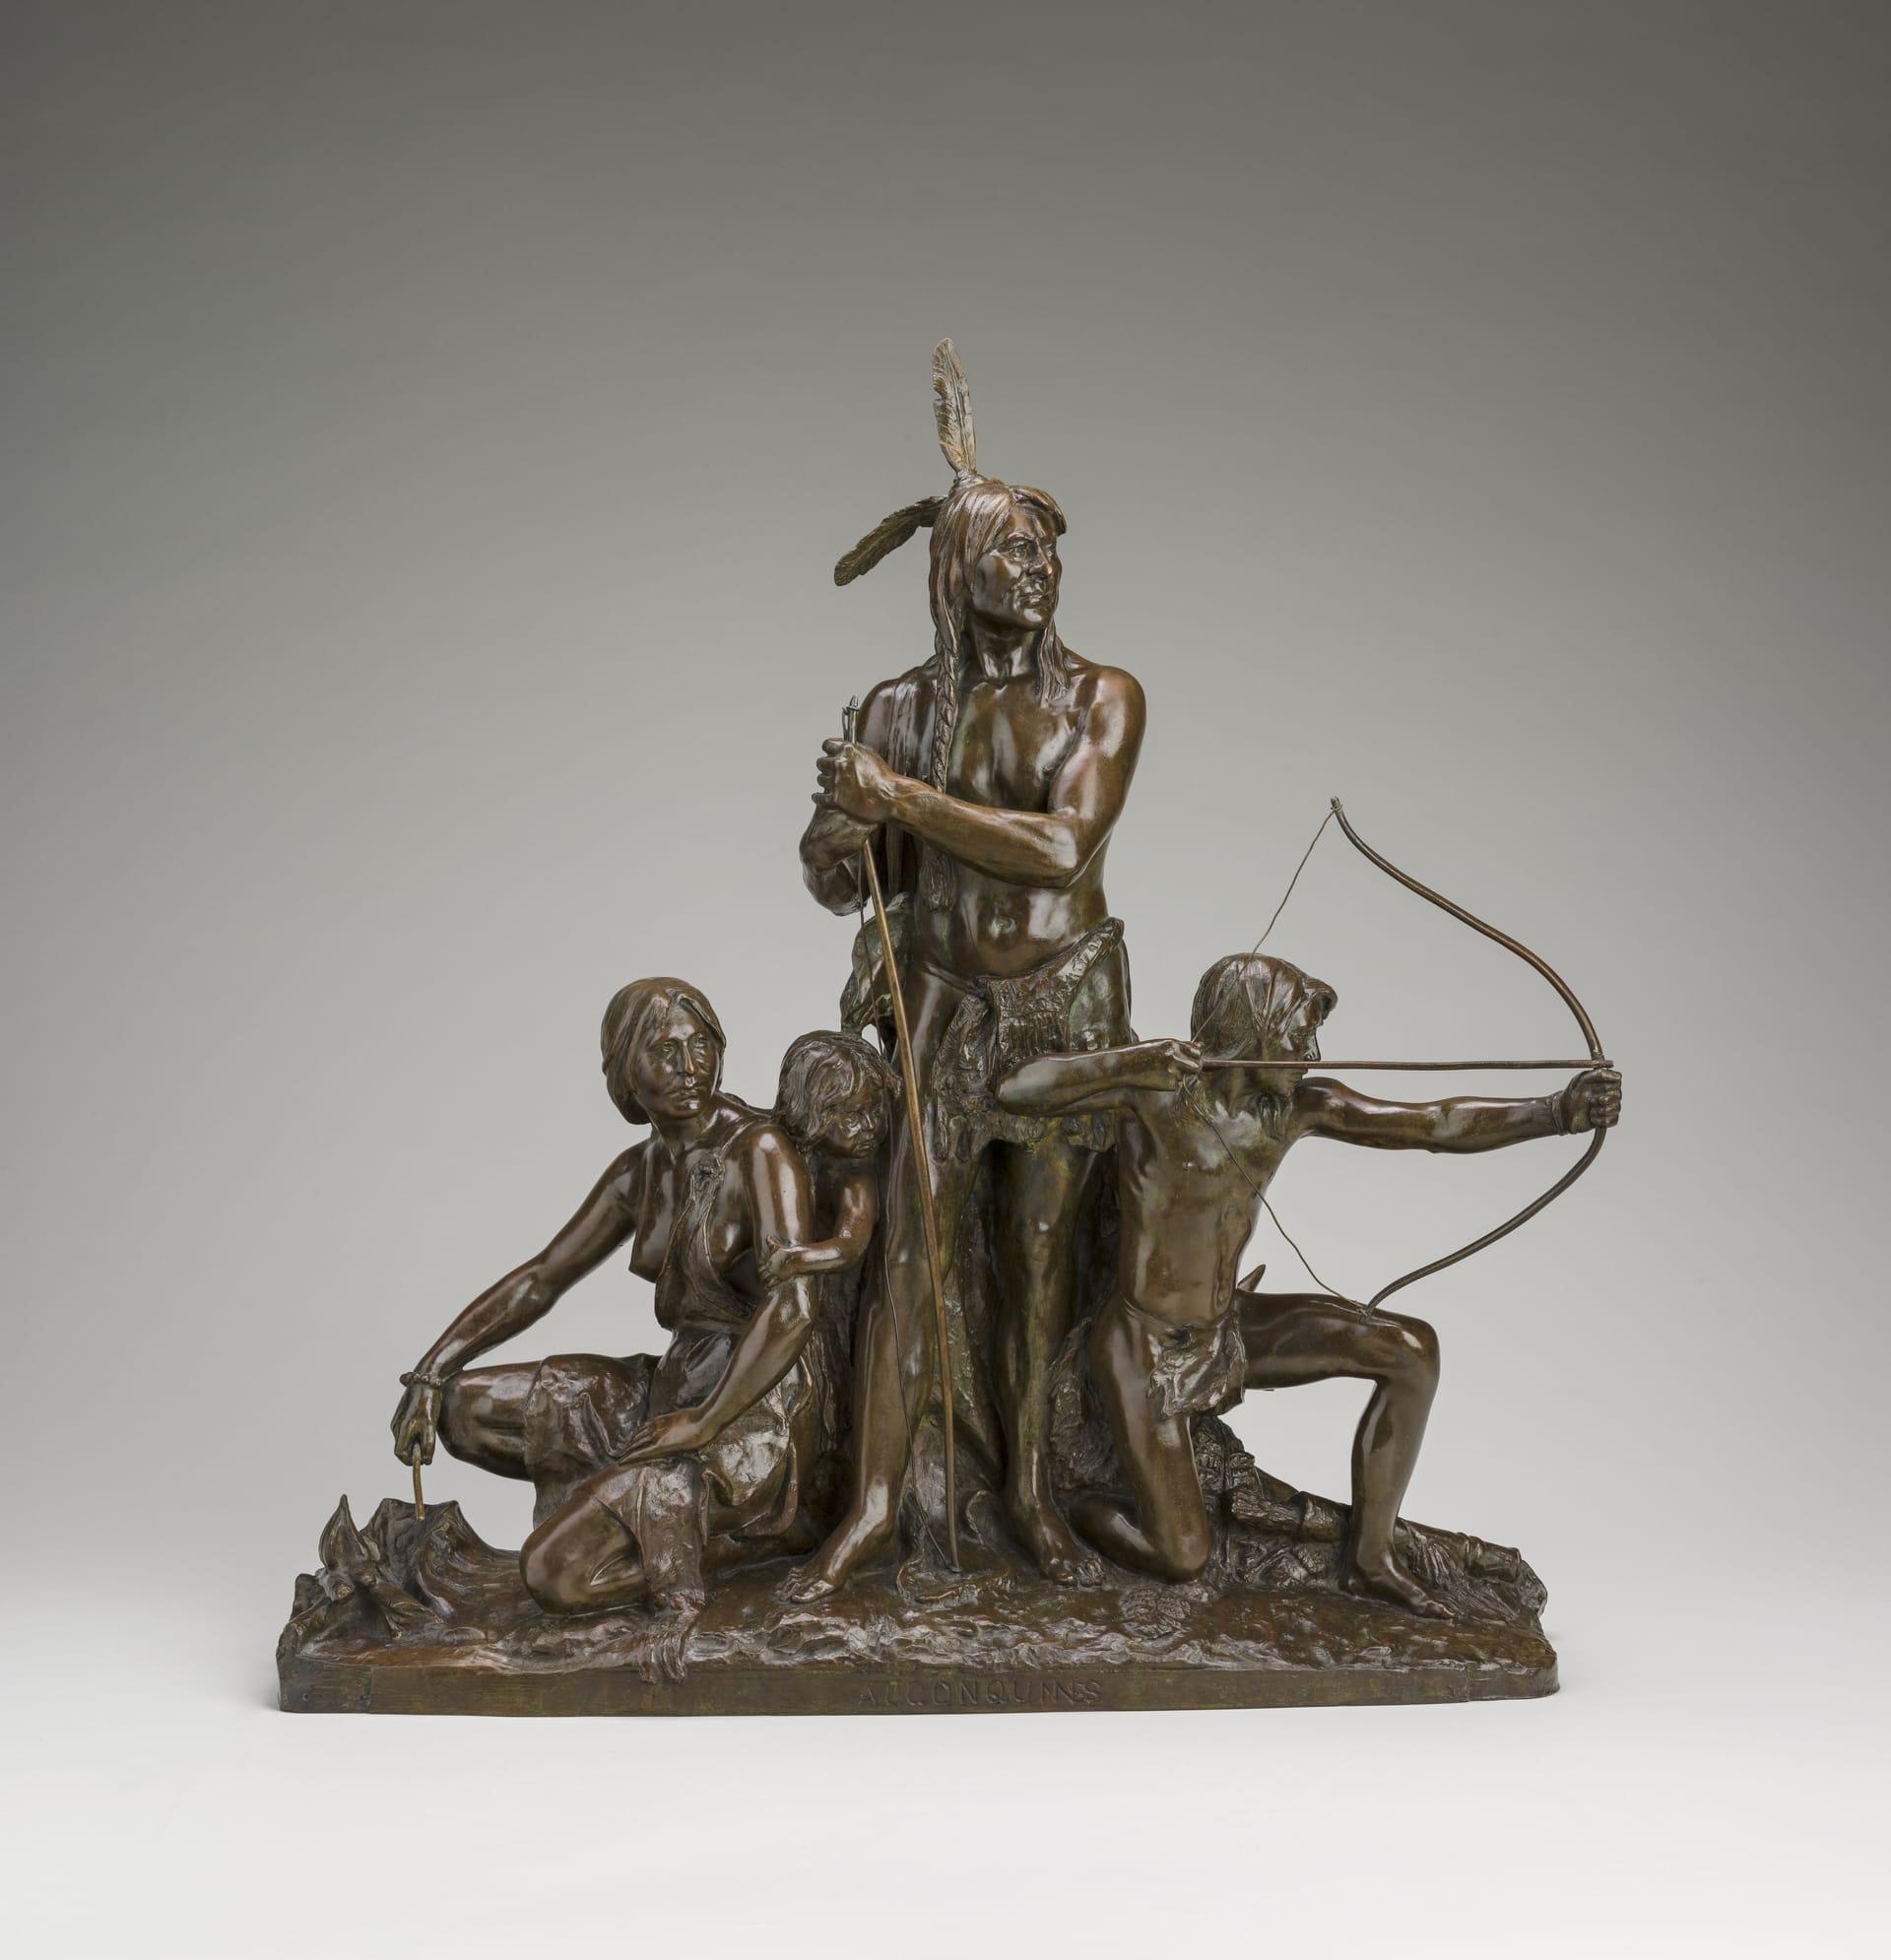 Algonquins - Hébert, Louis-Philippe | Collections | MNBAQ ...